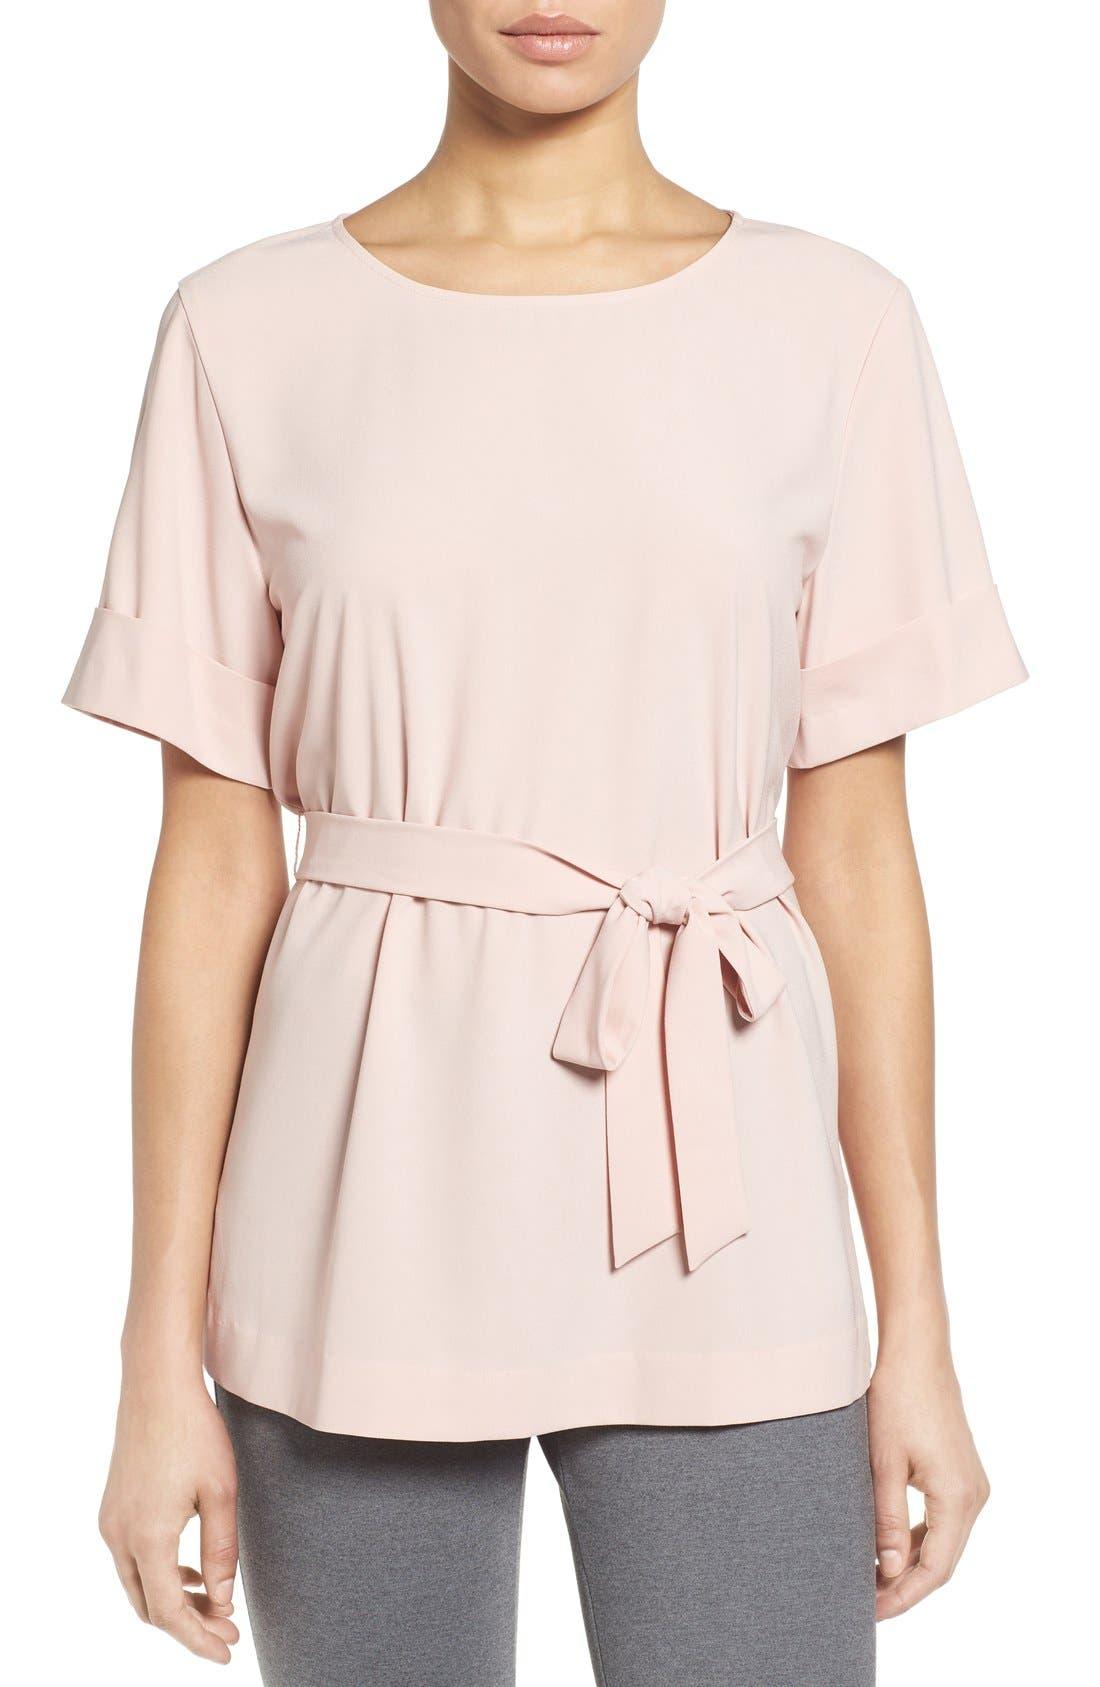 Main Image - Halogen® Belted Short Sleeve Top (Regular & Petite)